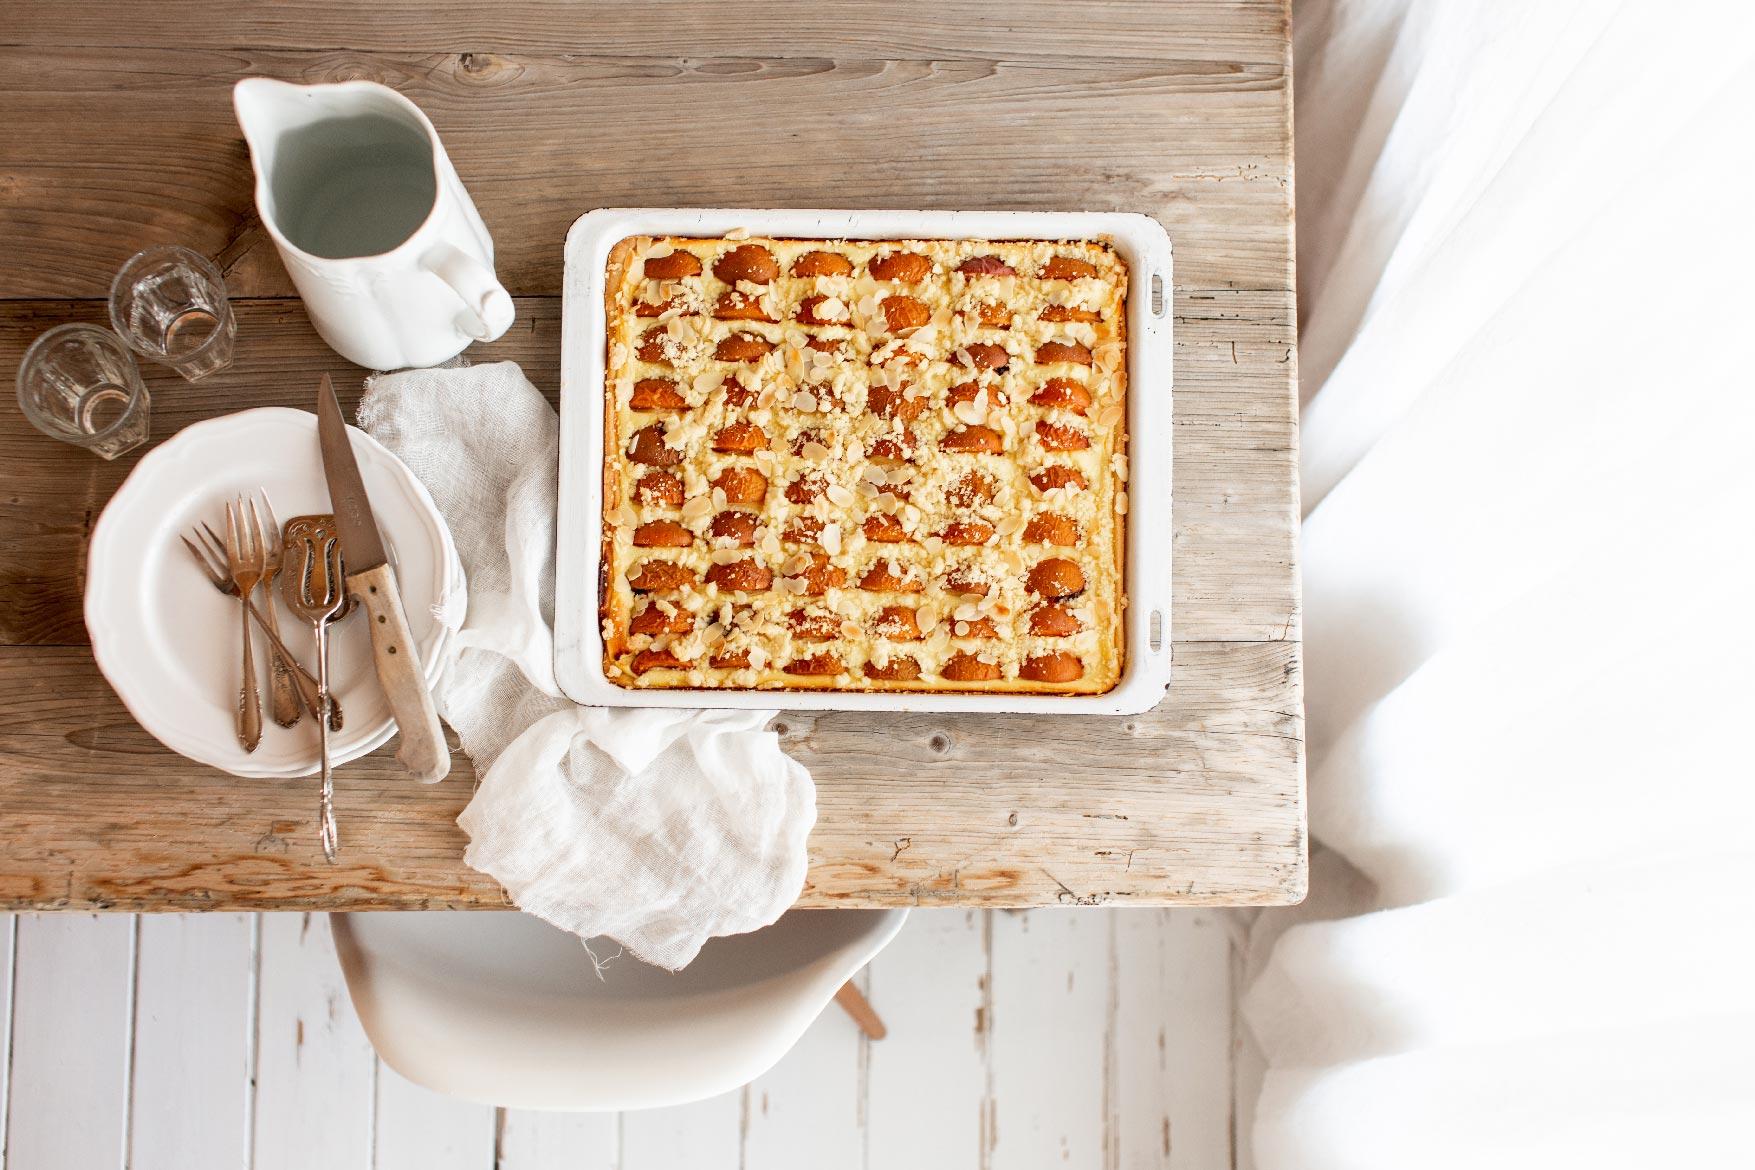 aprikosenkuchen, aprikosenblechkuchen, blechkuchen, aprikose, saisonal, backen, küche, aus meiner küche, rezept, sommer, gwiegabriela, gwie, emmeküche